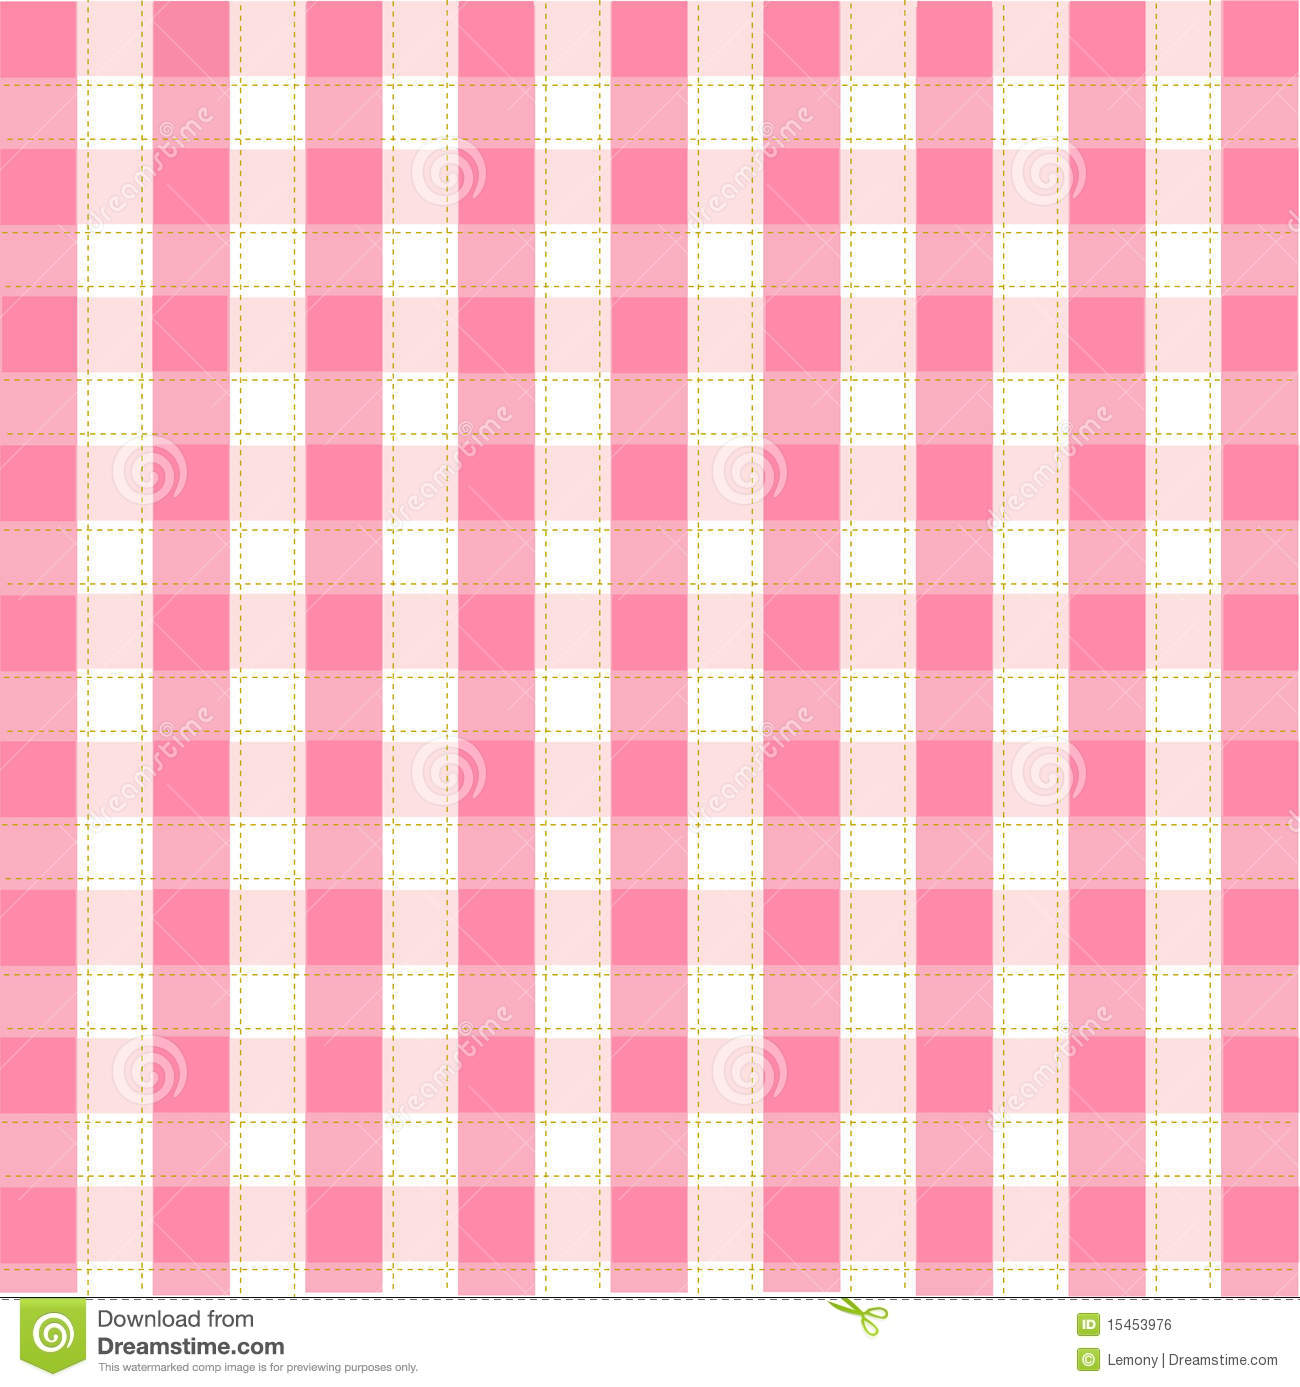 Pink plaid wallpaper wallpapersafari Define plaid